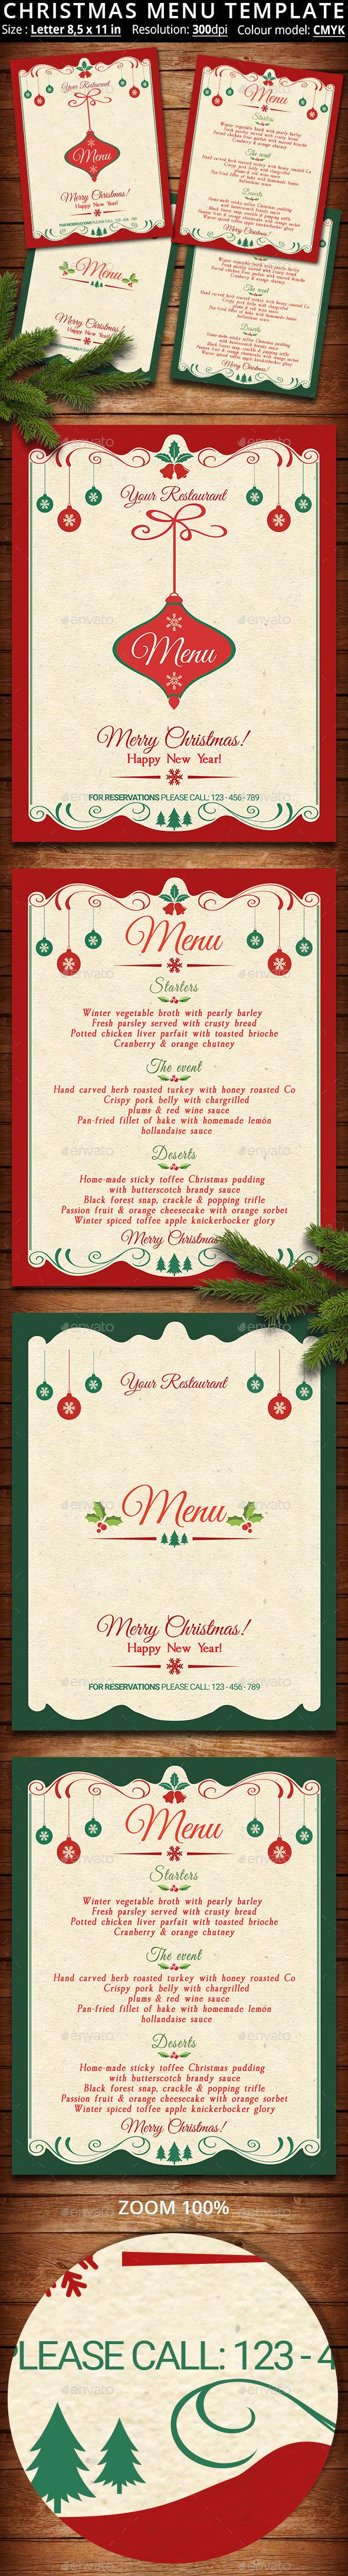 Christmas Menu Template - Restaurant Flyers